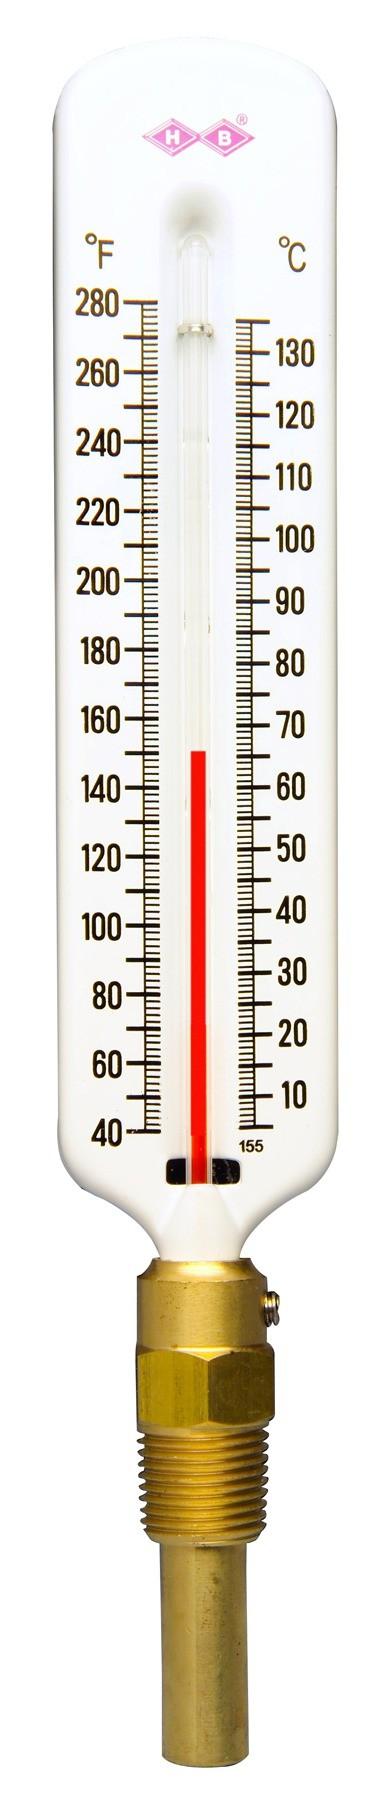 H-B DURAC Hot Water/Refrigerant Line Liquid-In-Glass Thermometers; Organic Liquid Fill